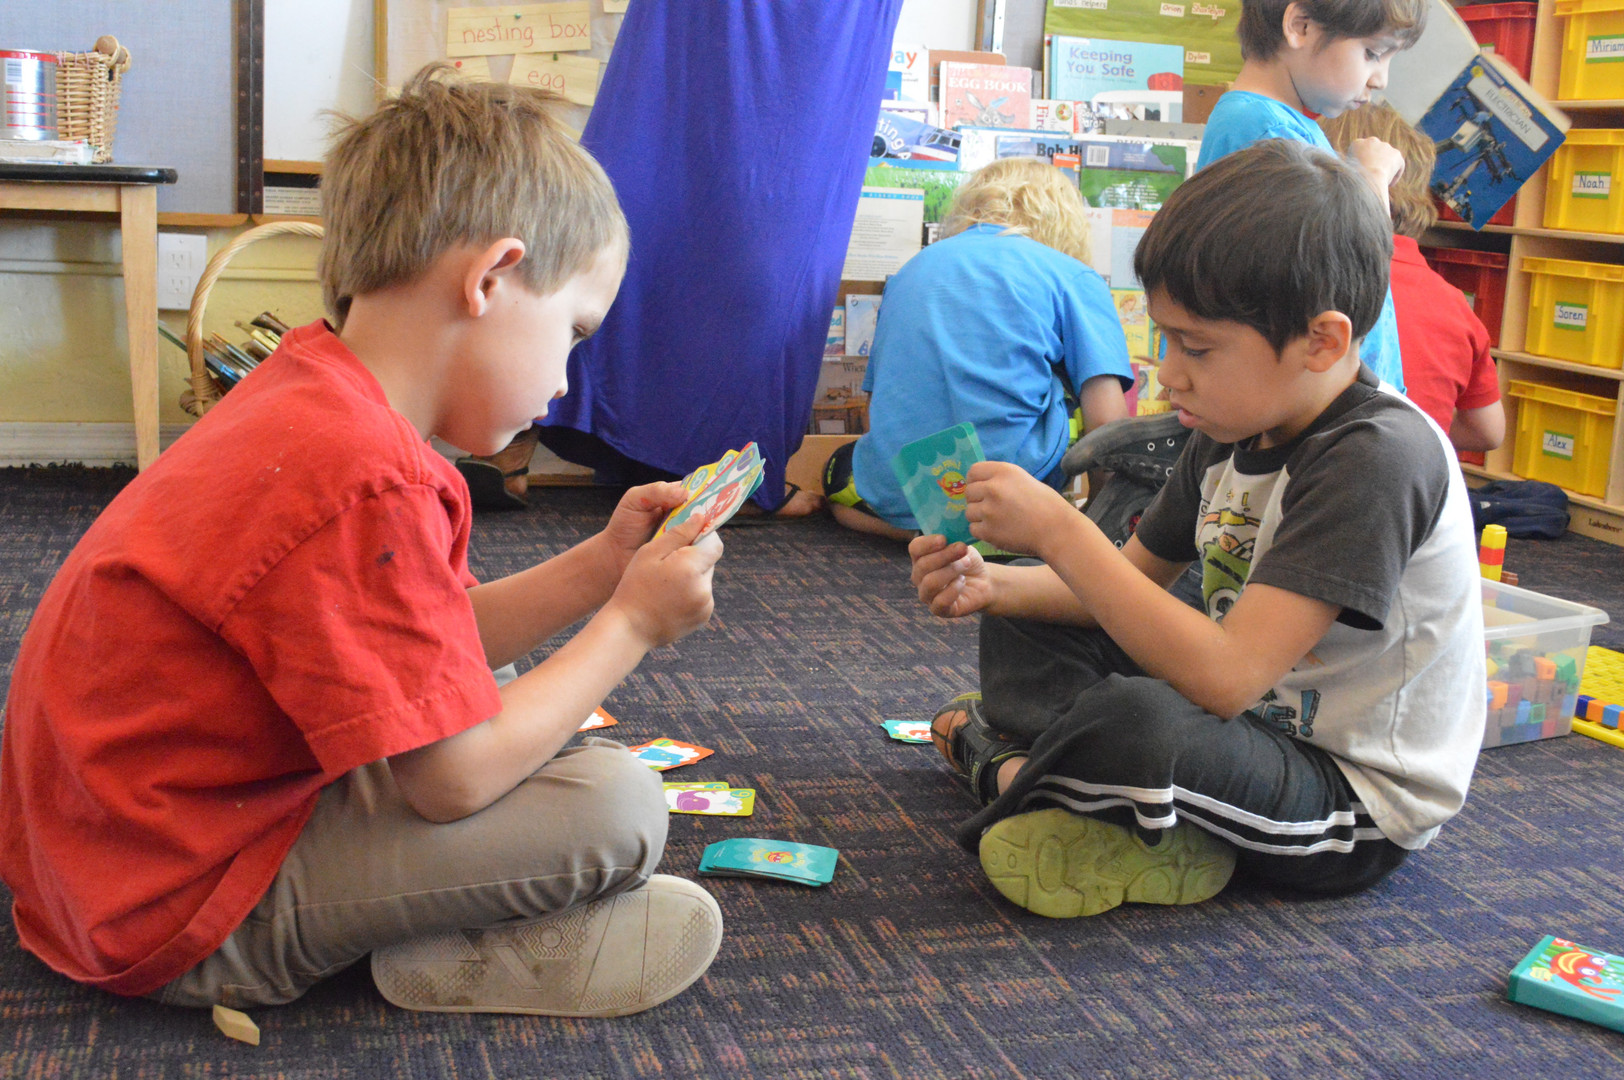 2 boys playing cards.jpg